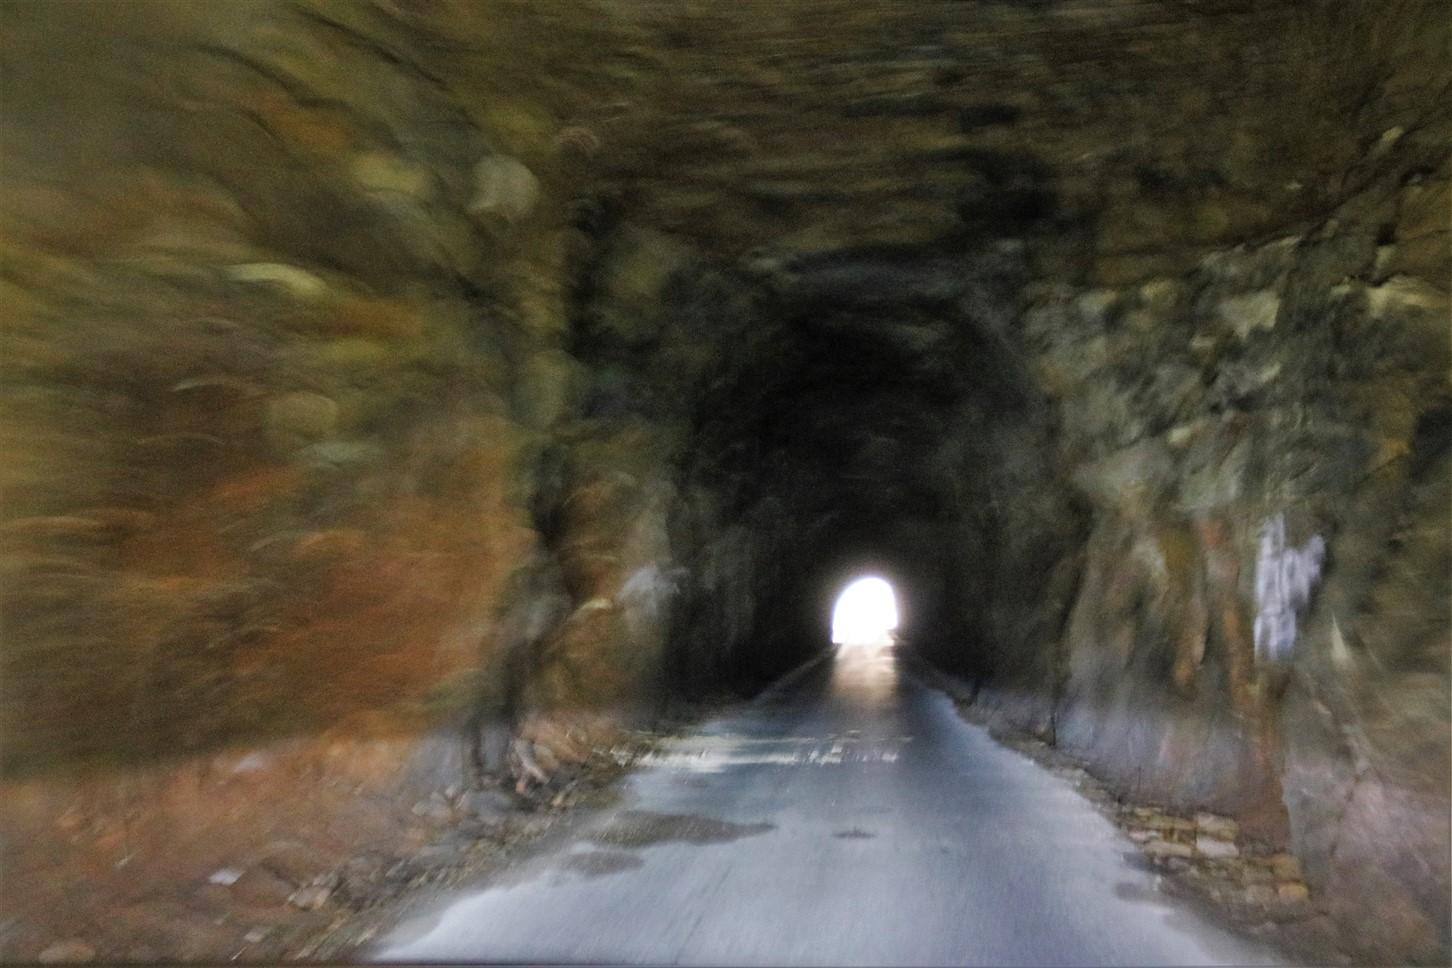 2016 11 13 45 Nada Tunnel KY.jpg